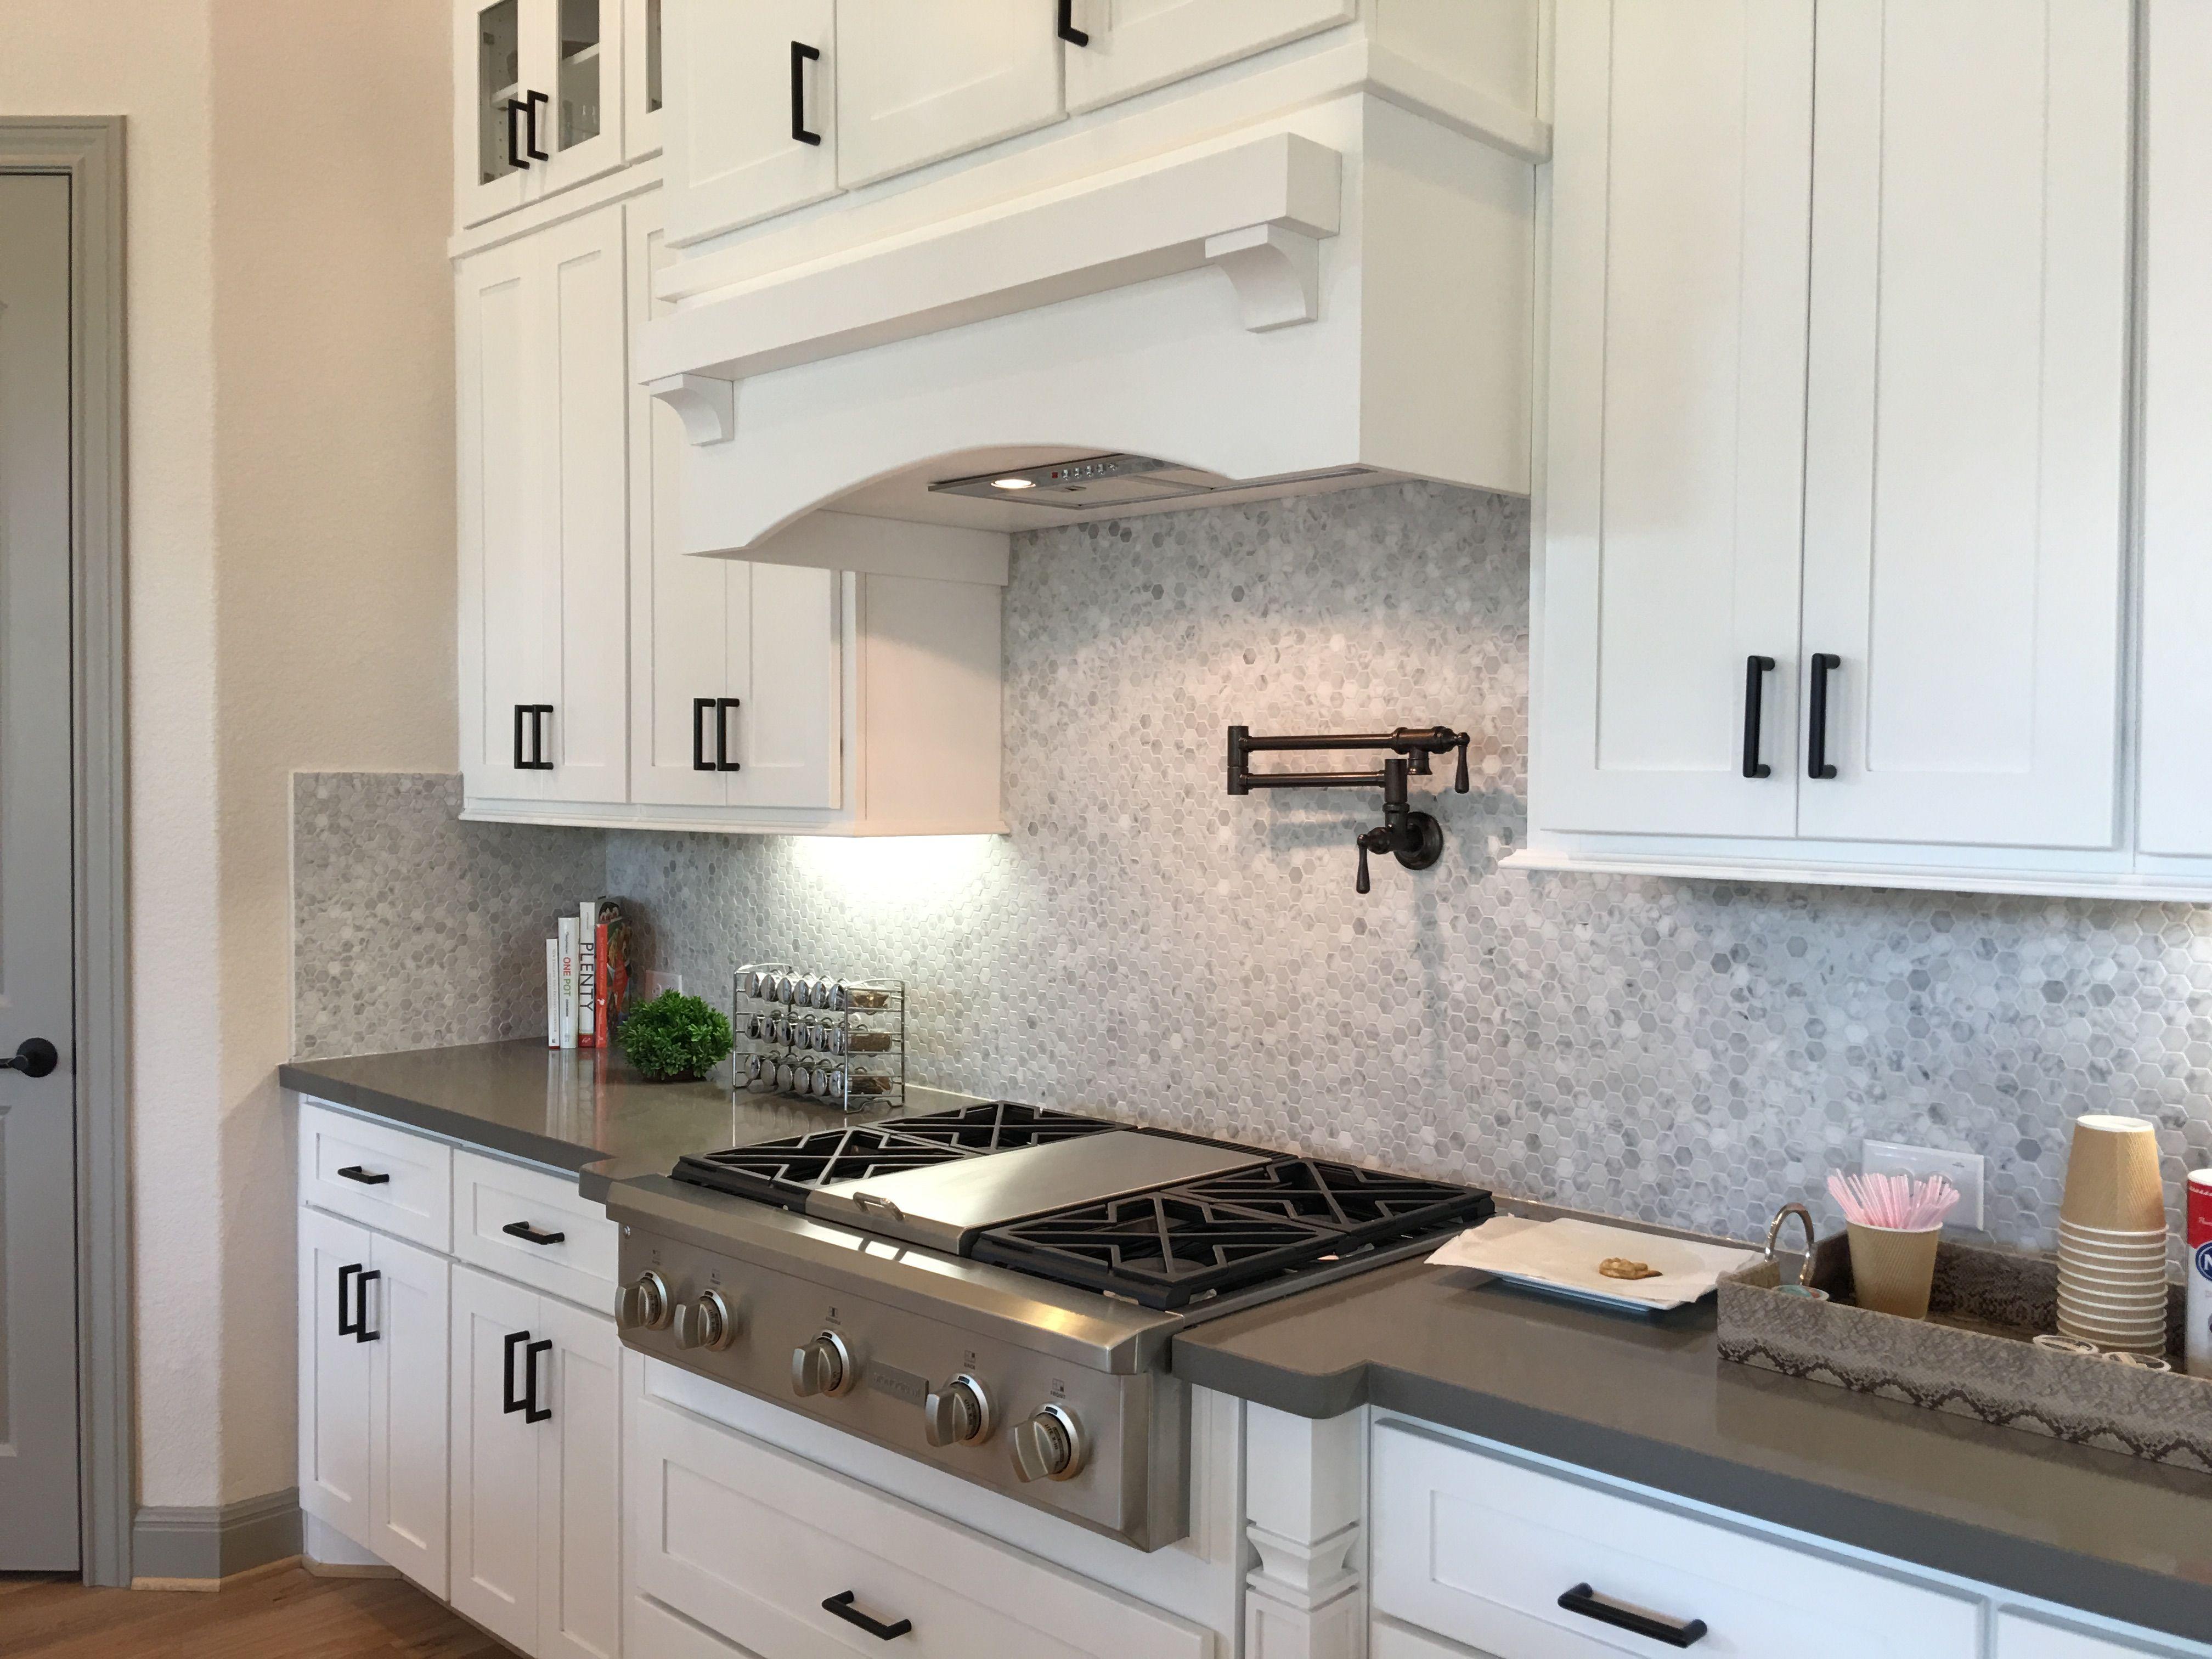 Water Faucet Above Stove Kitchen Decor Kitchen Reno Kitchen